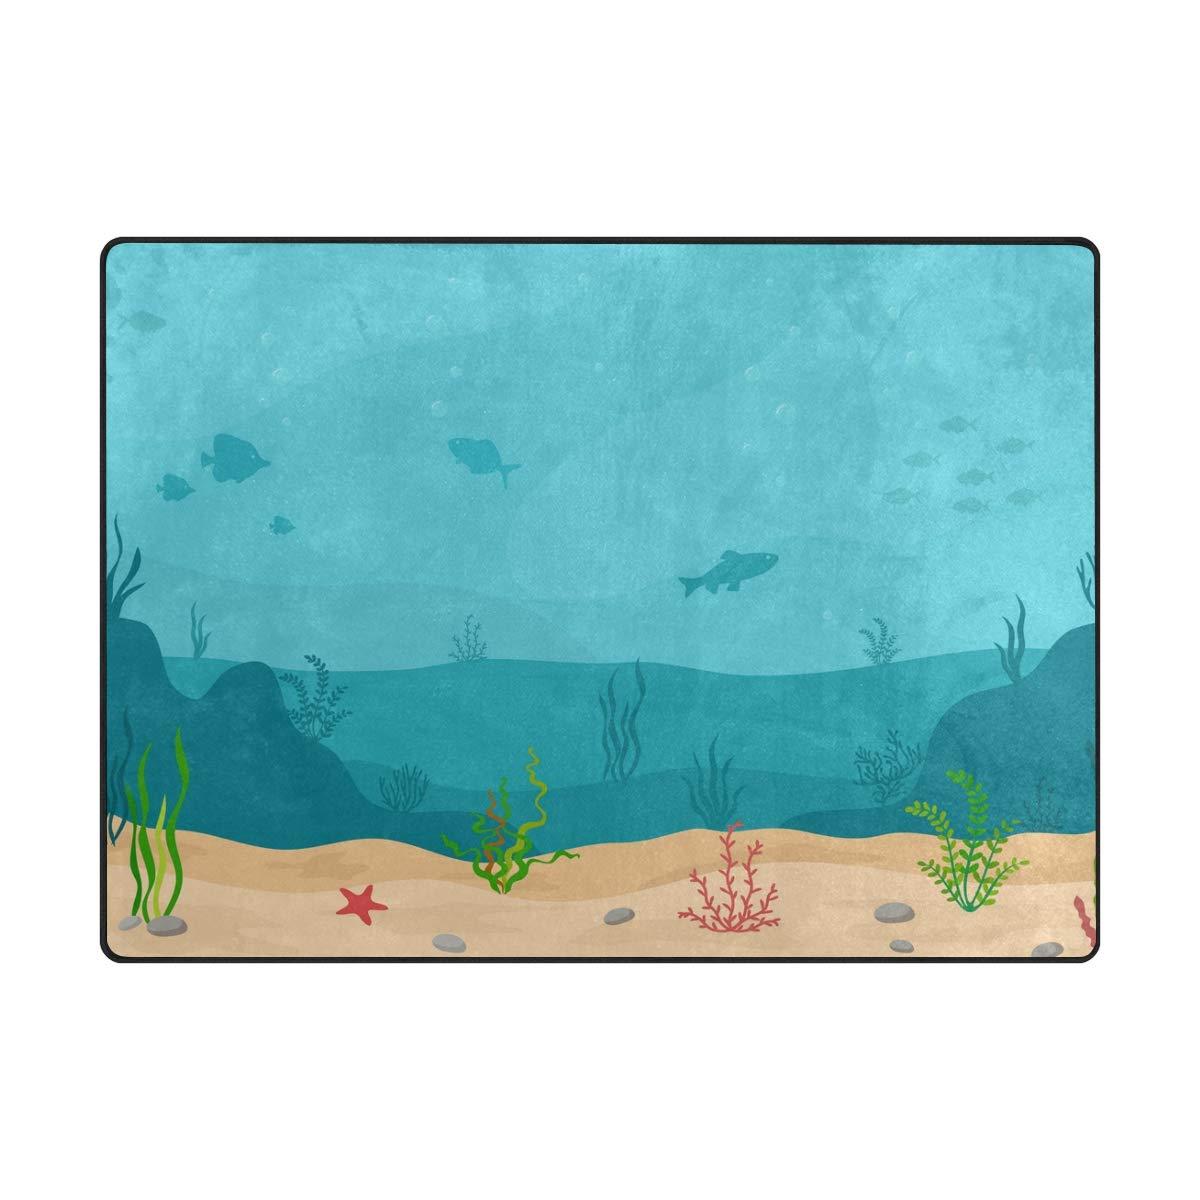 La Random Large Soft Rugs 63x48 Inches Marine Sea Plants Non-Skid Lightweight Nursery Yoga Rugs Play Mat for Kids Playing Room Living Room Bedroom Floor Mats